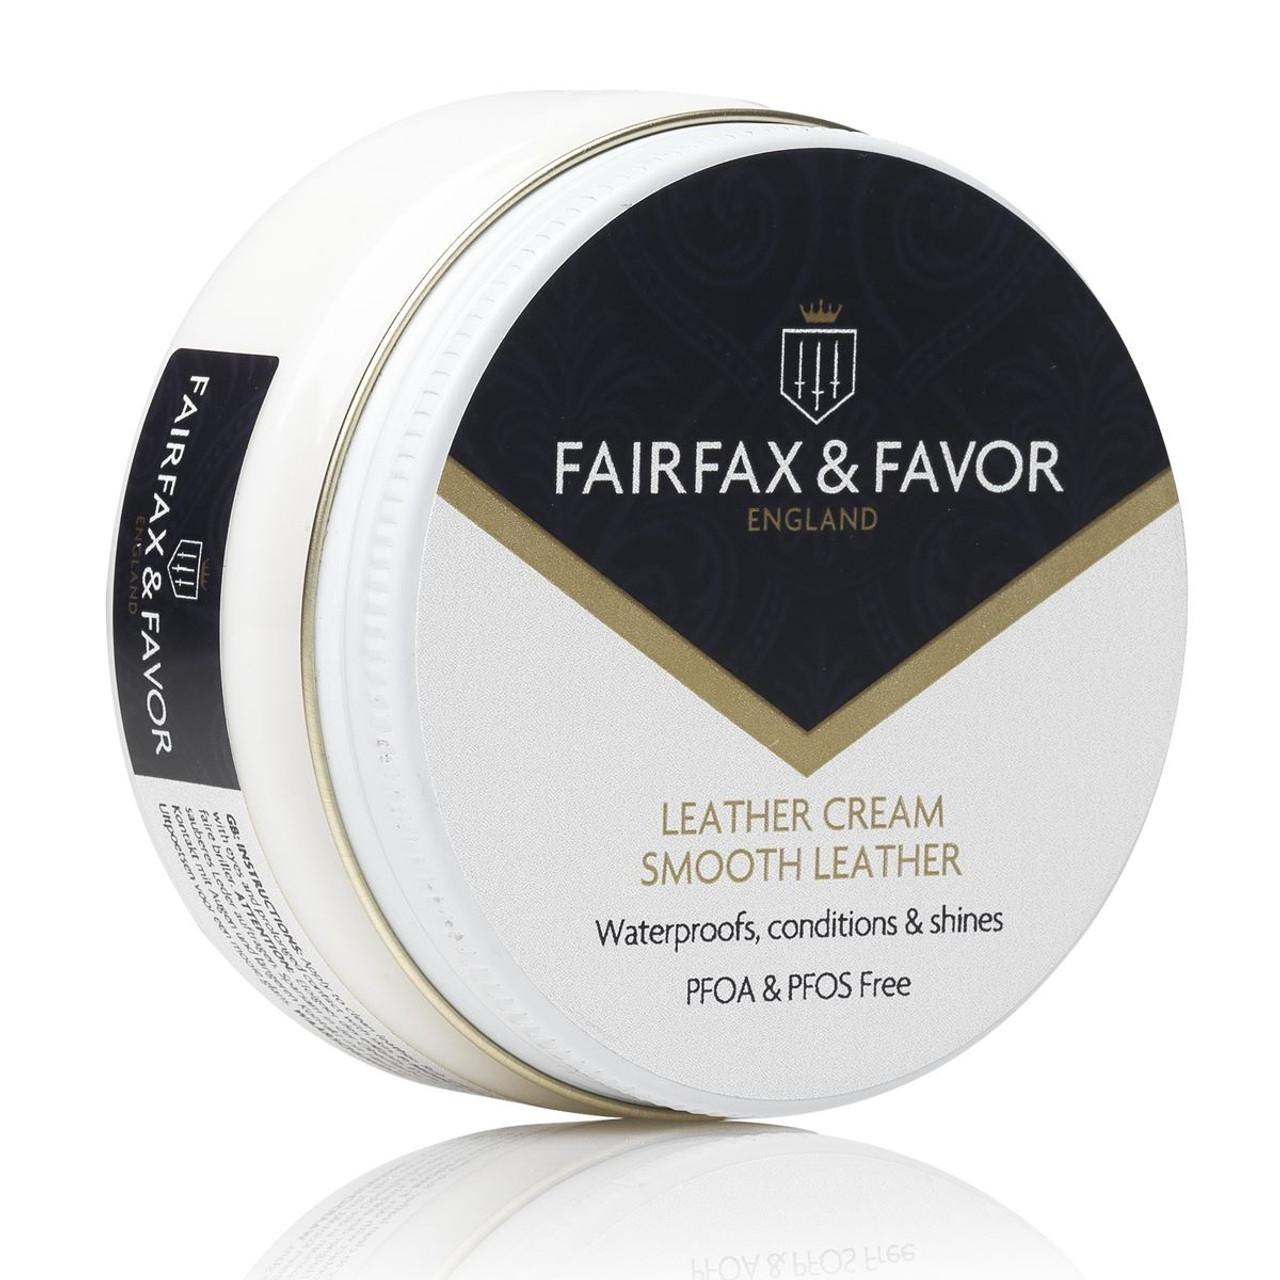 Fairfax & Favor Natural Leather Cream